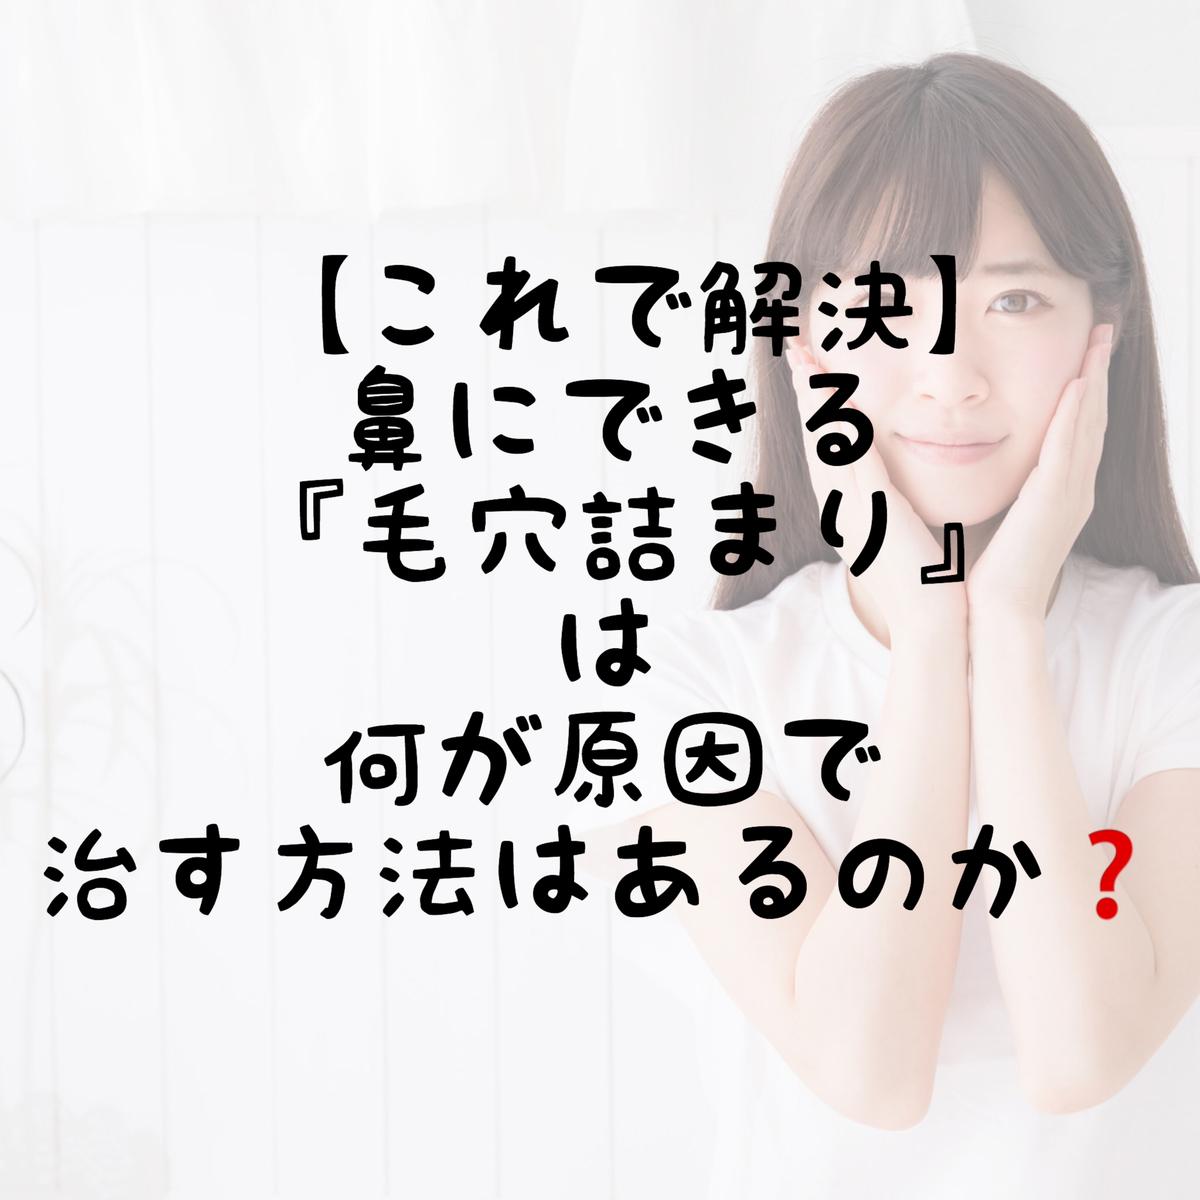 f:id:nokonoko_o:20200624193150j:plain